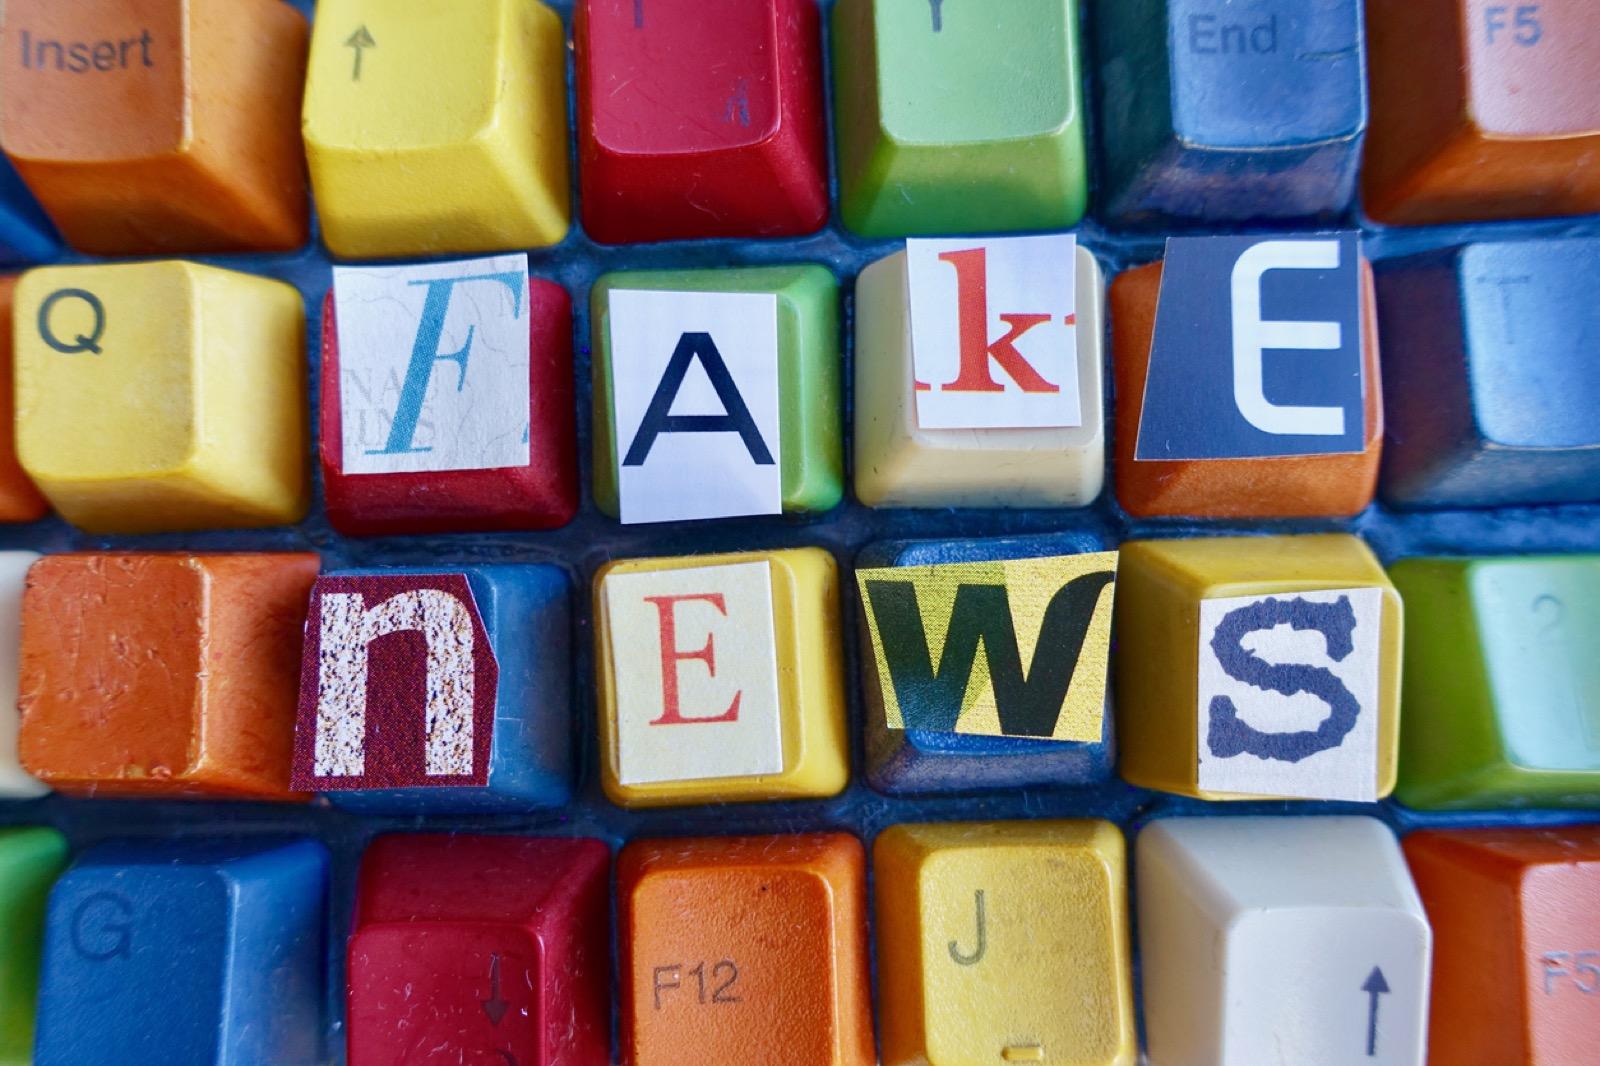 Fake-news-letters-on-colorful-keys-694879770_1258x838 (1)_Web.jpeg